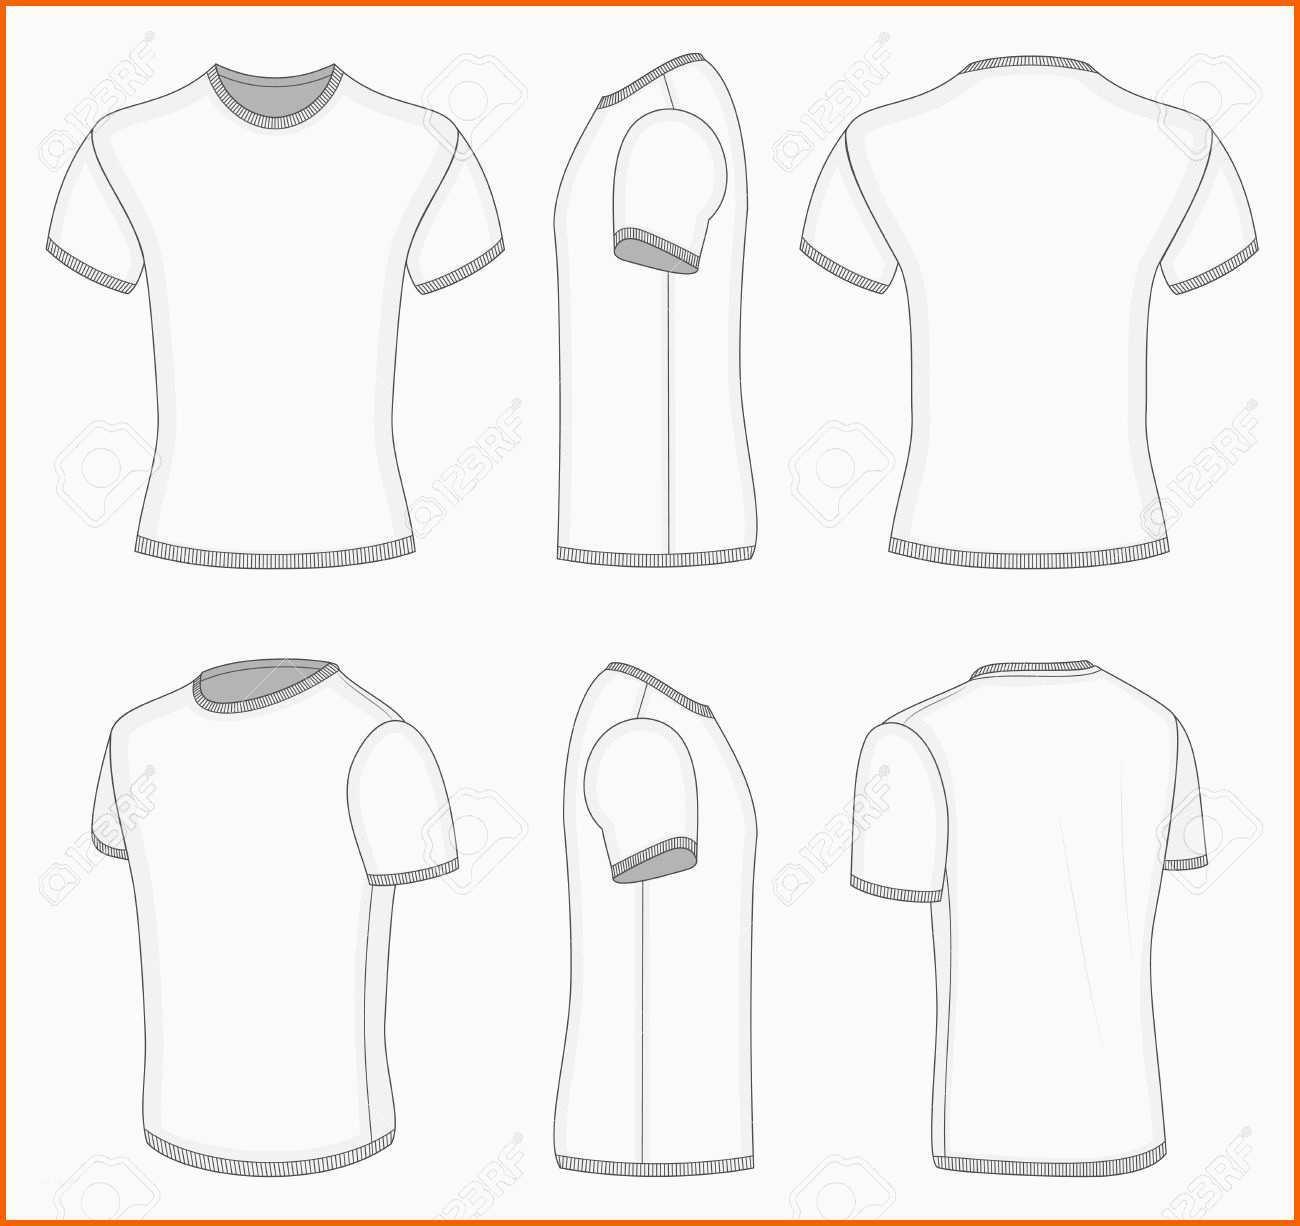 kreativ white t shirt design template templates station